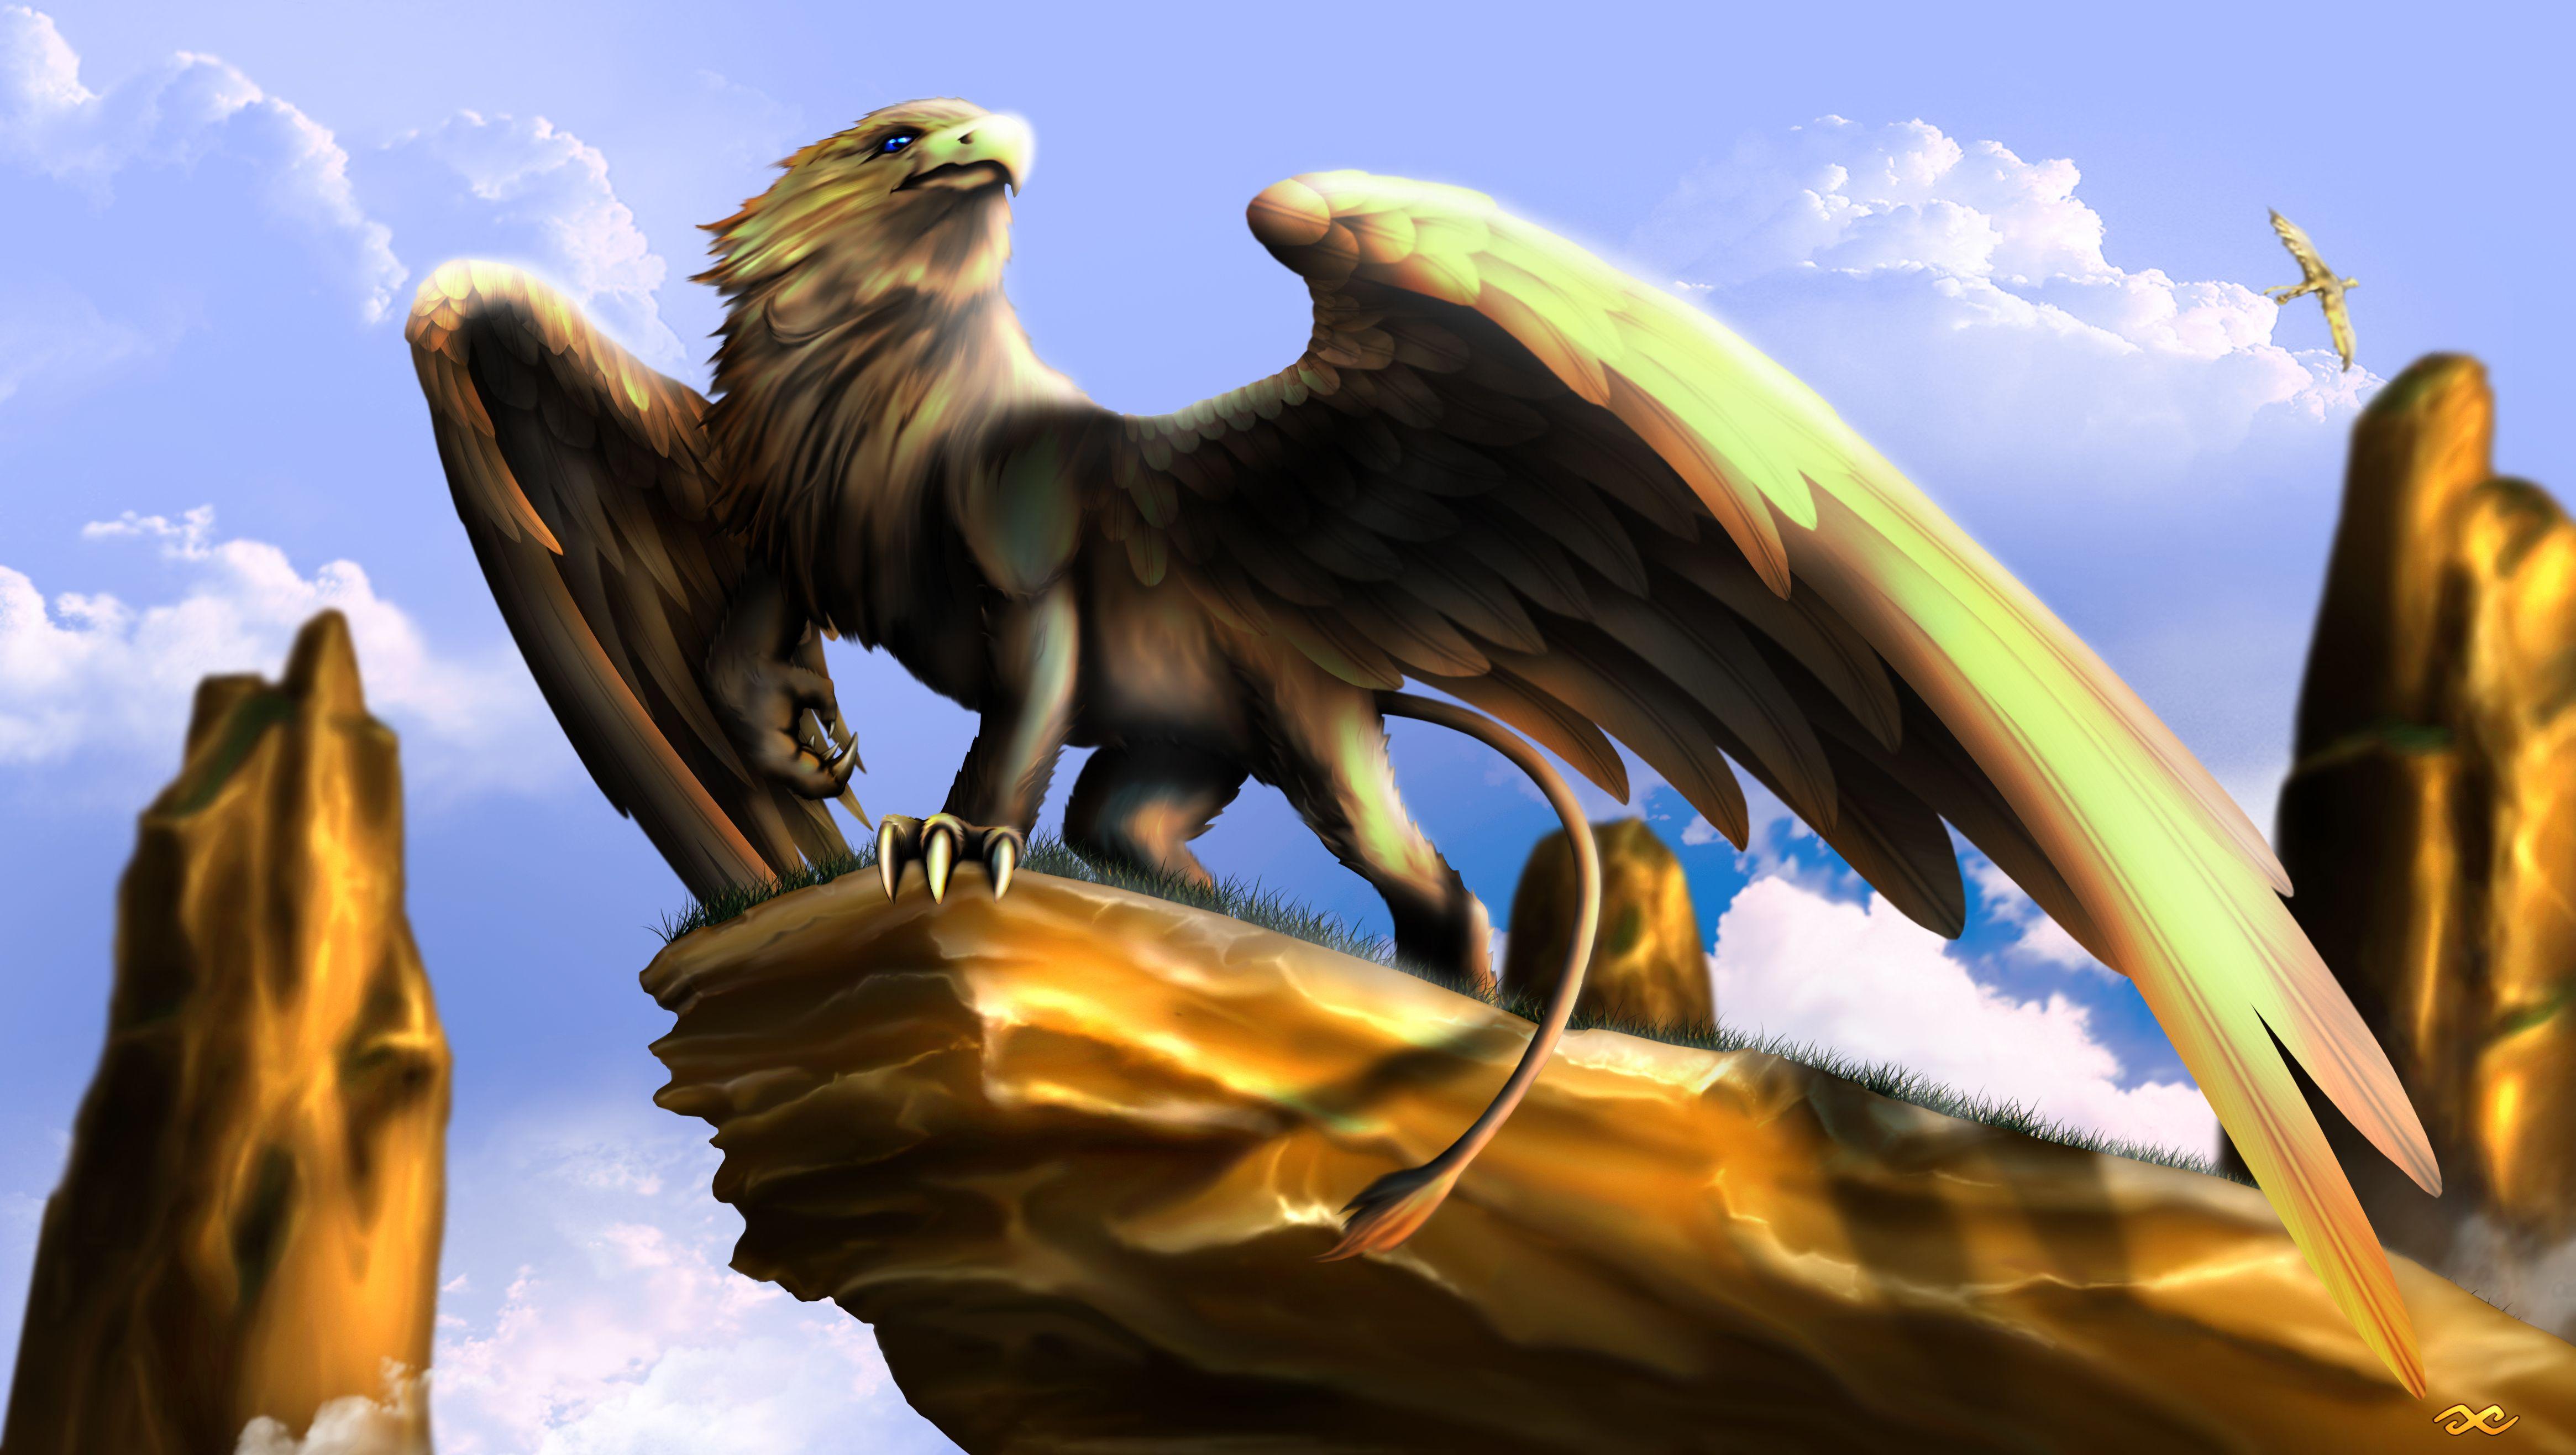 Painting Art Phoenix Fire Fantasy Digital Drawing: Griffin By Guillaume Phoenix Digital Art Drawings